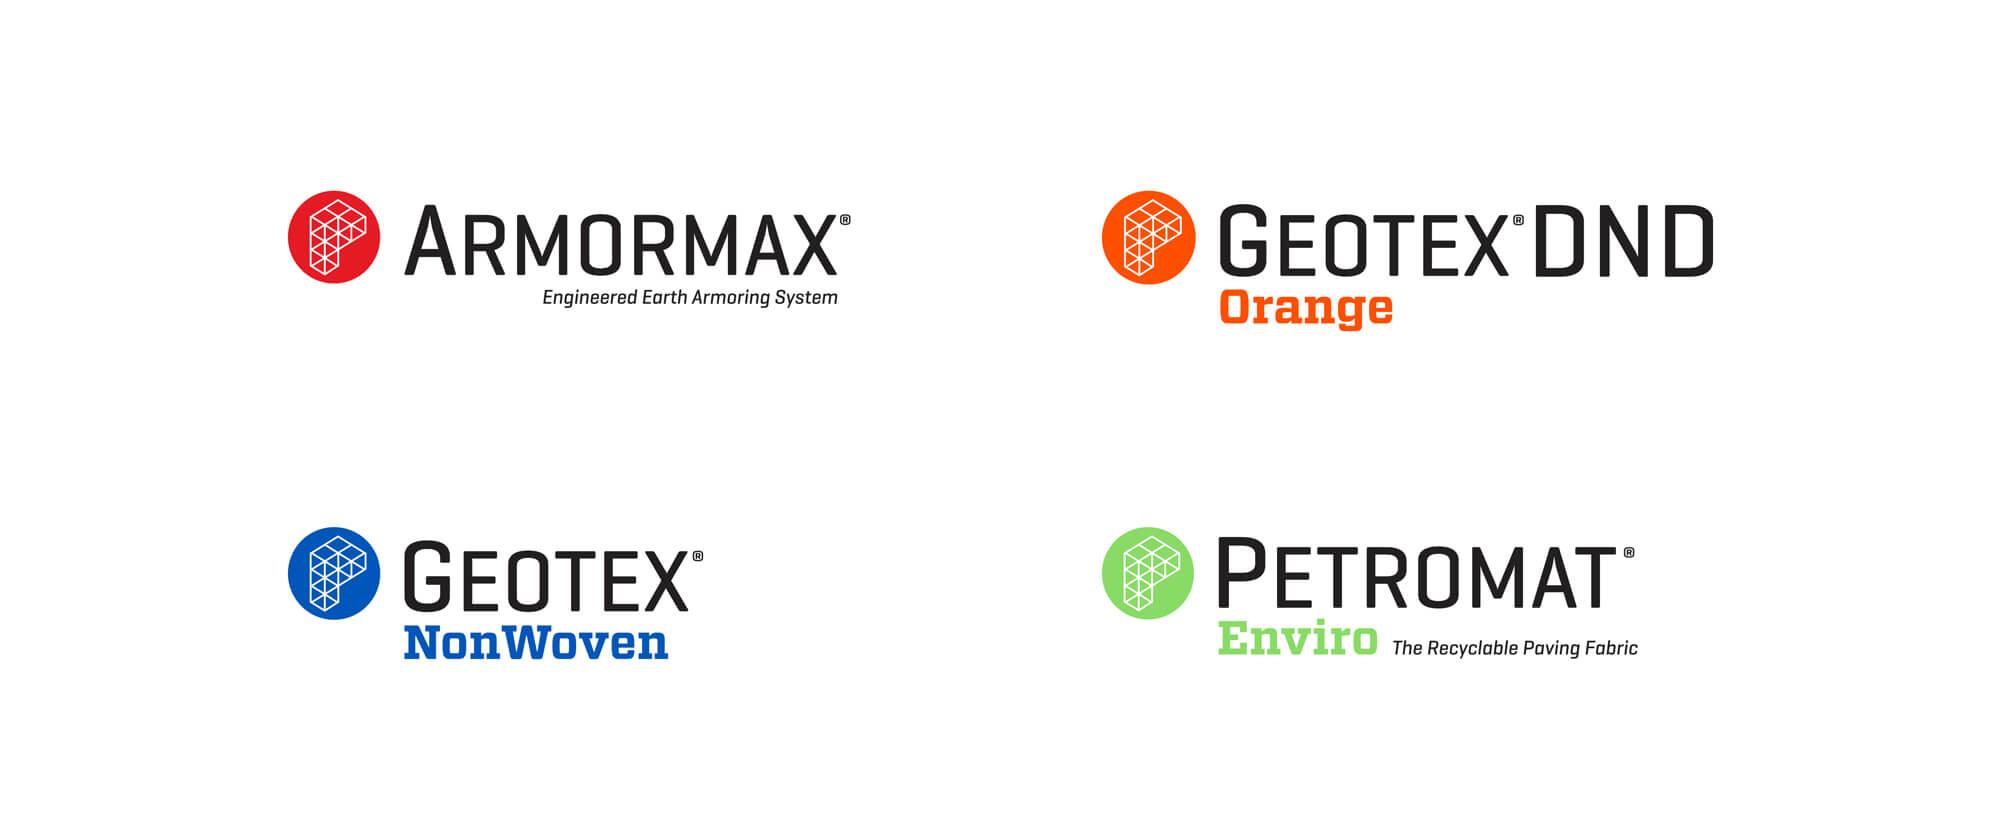 propex-subbrand-logos.jpg